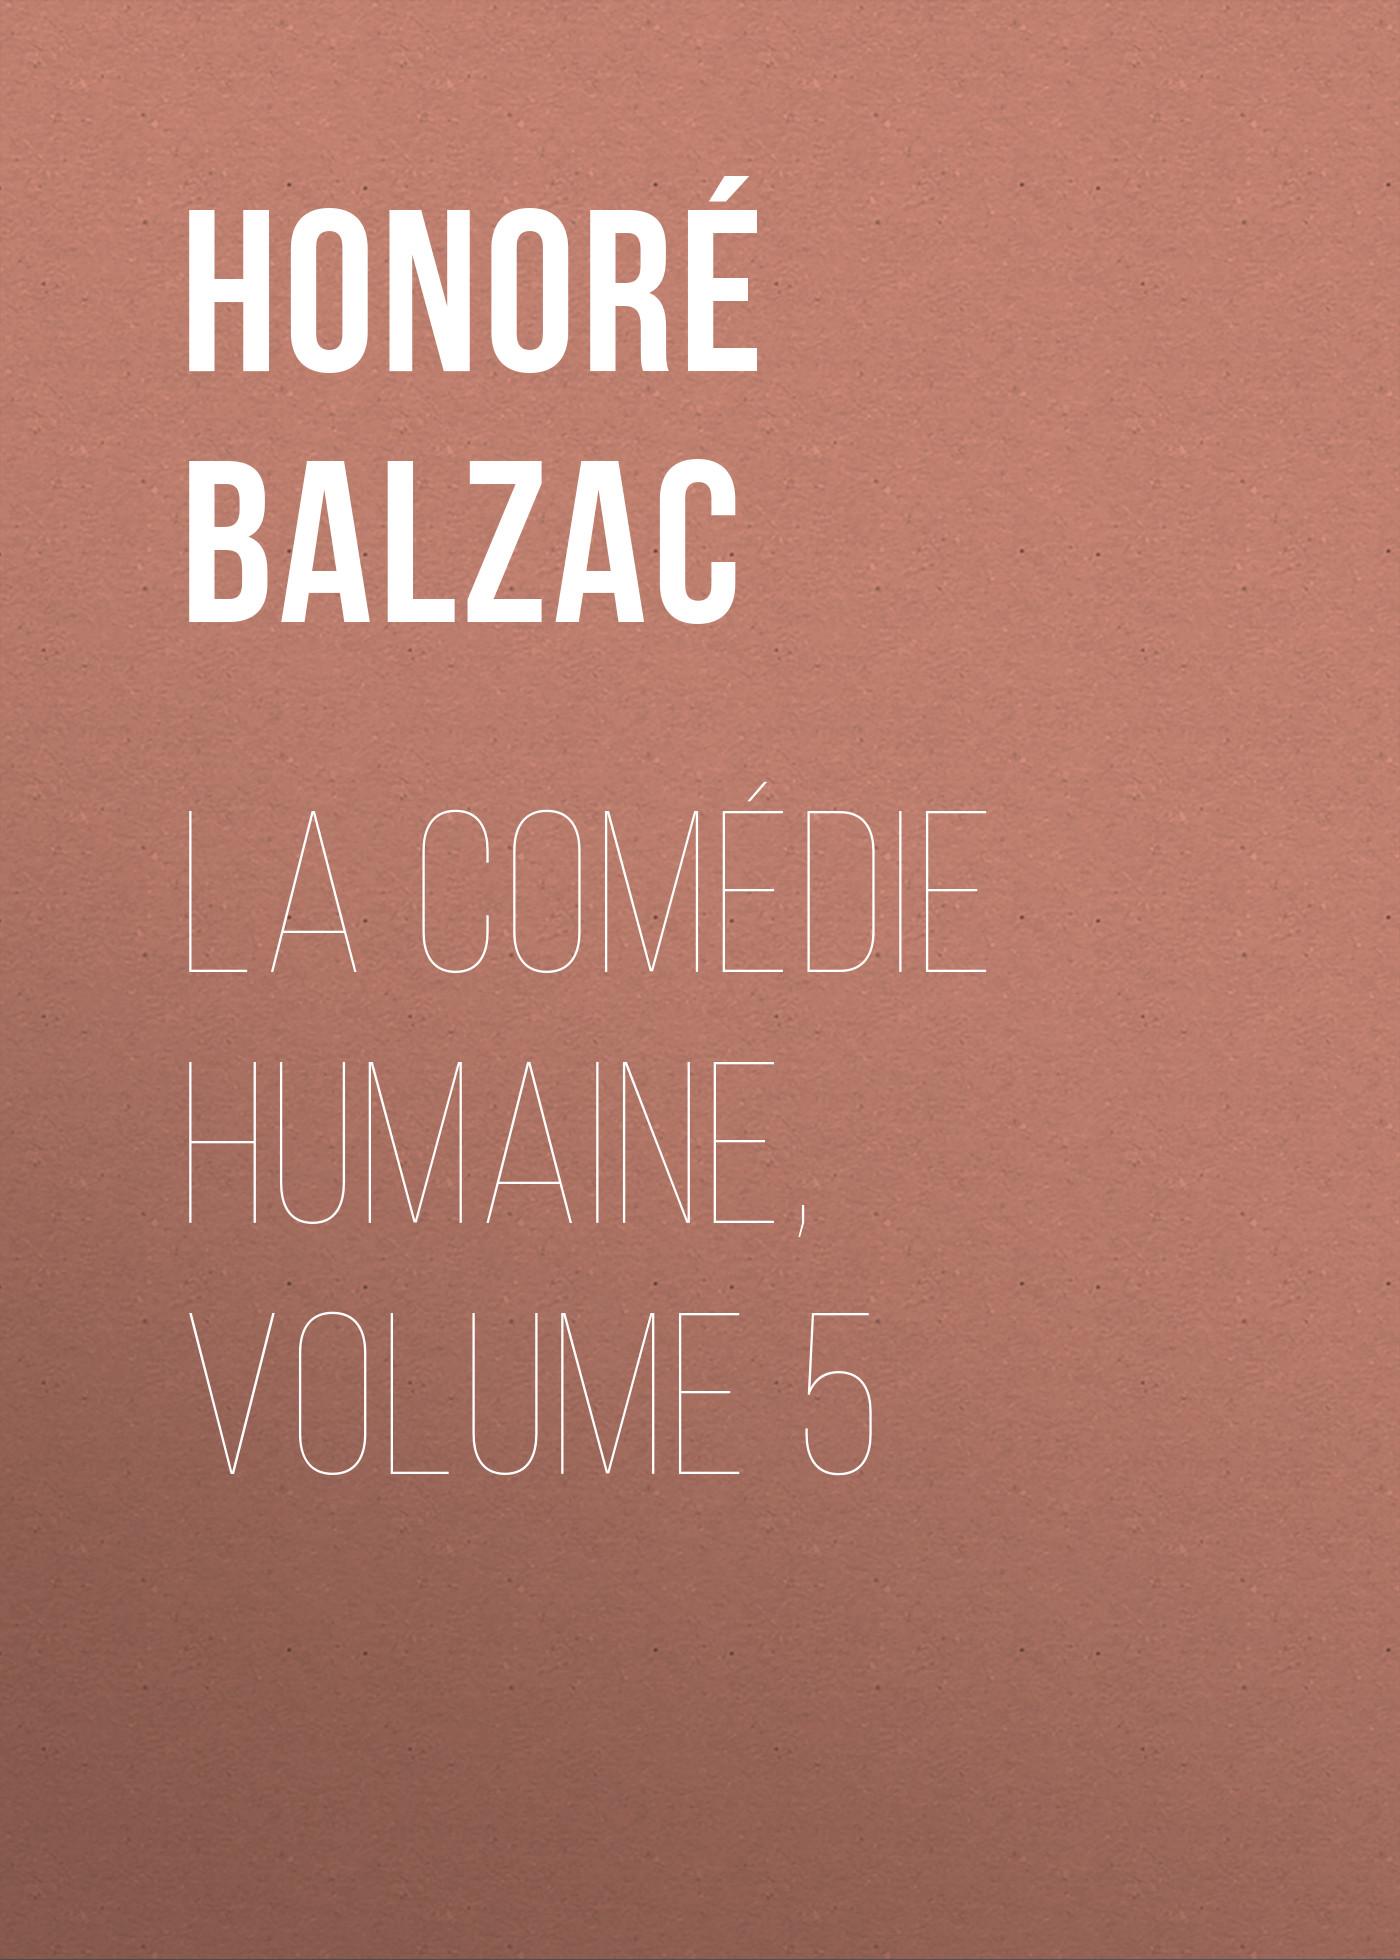 la comedie humaine volume 5